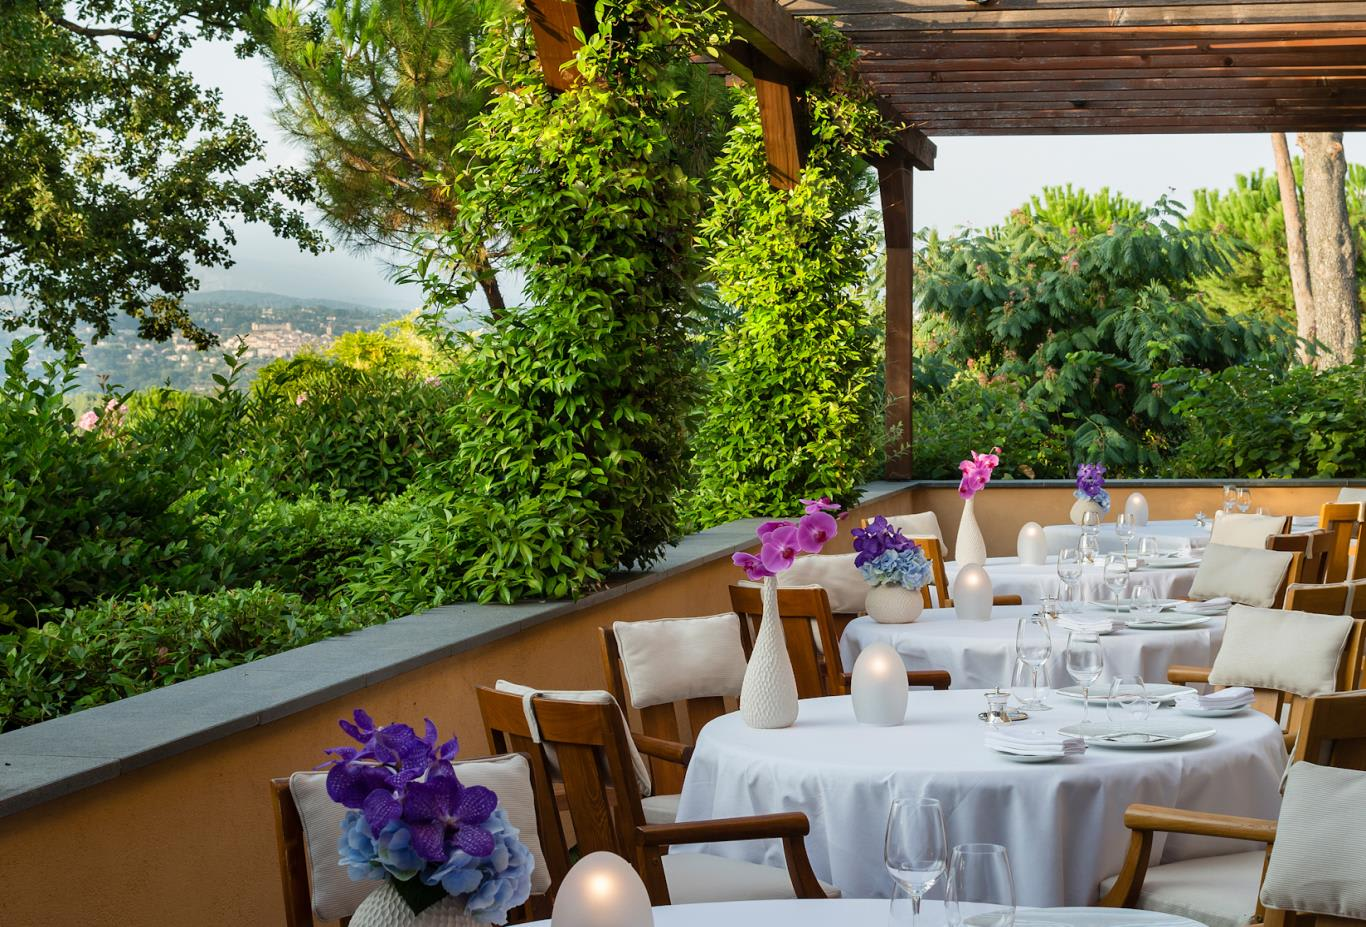 Faventia-restaurant-terrace